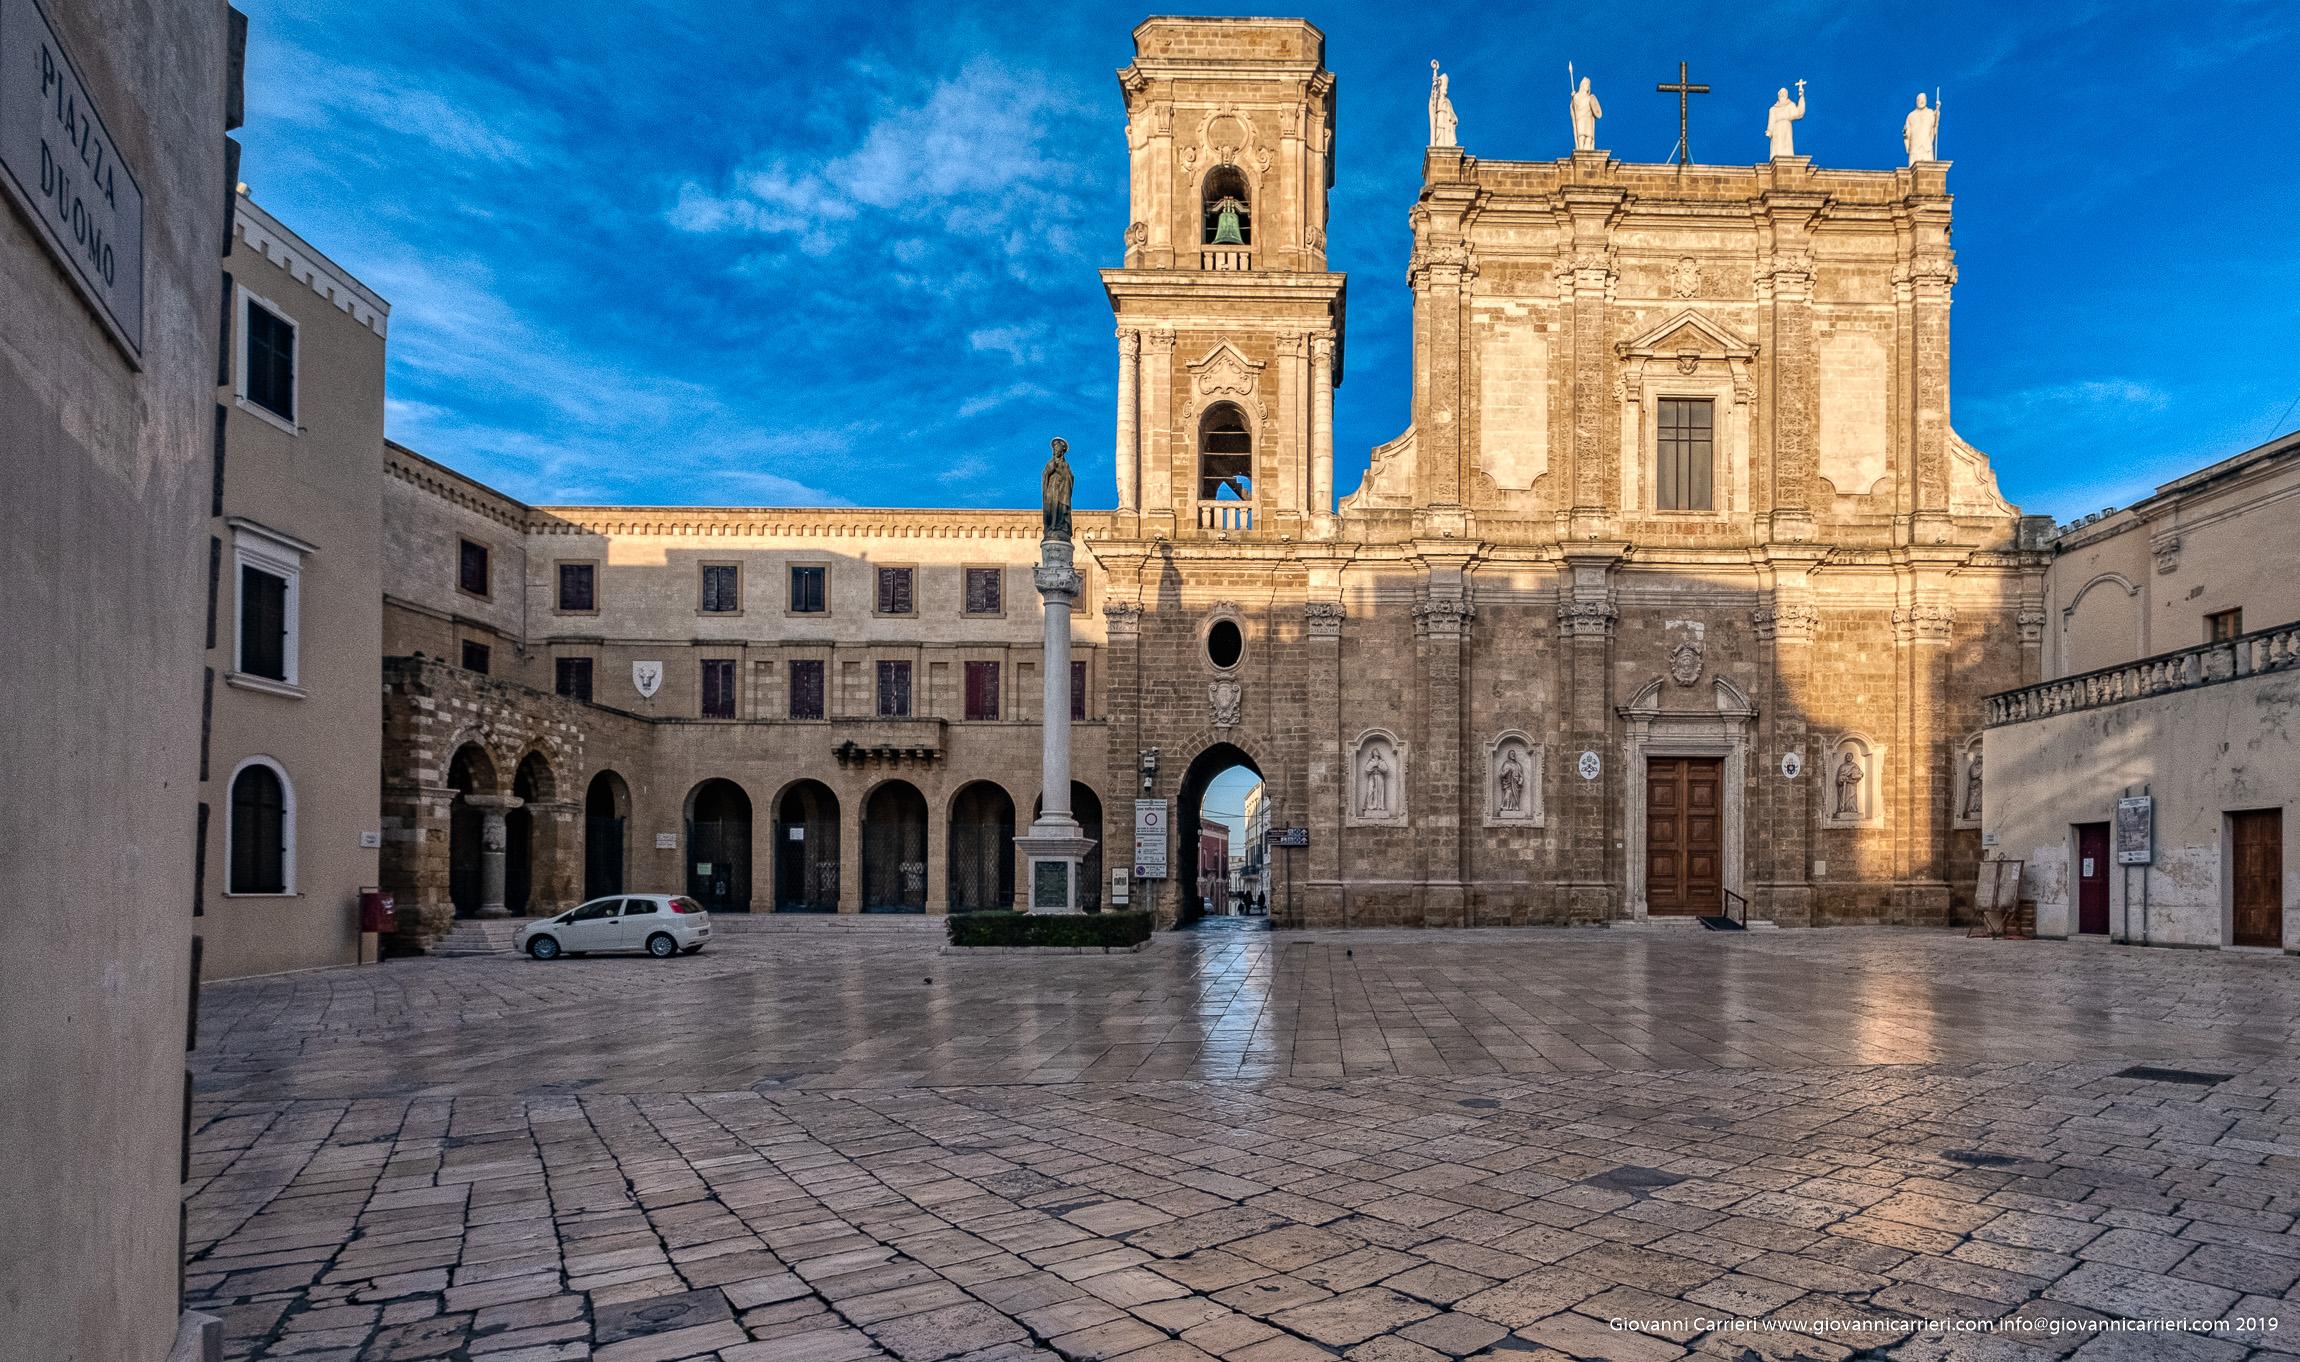 La Piazza Duomo di Brindisi